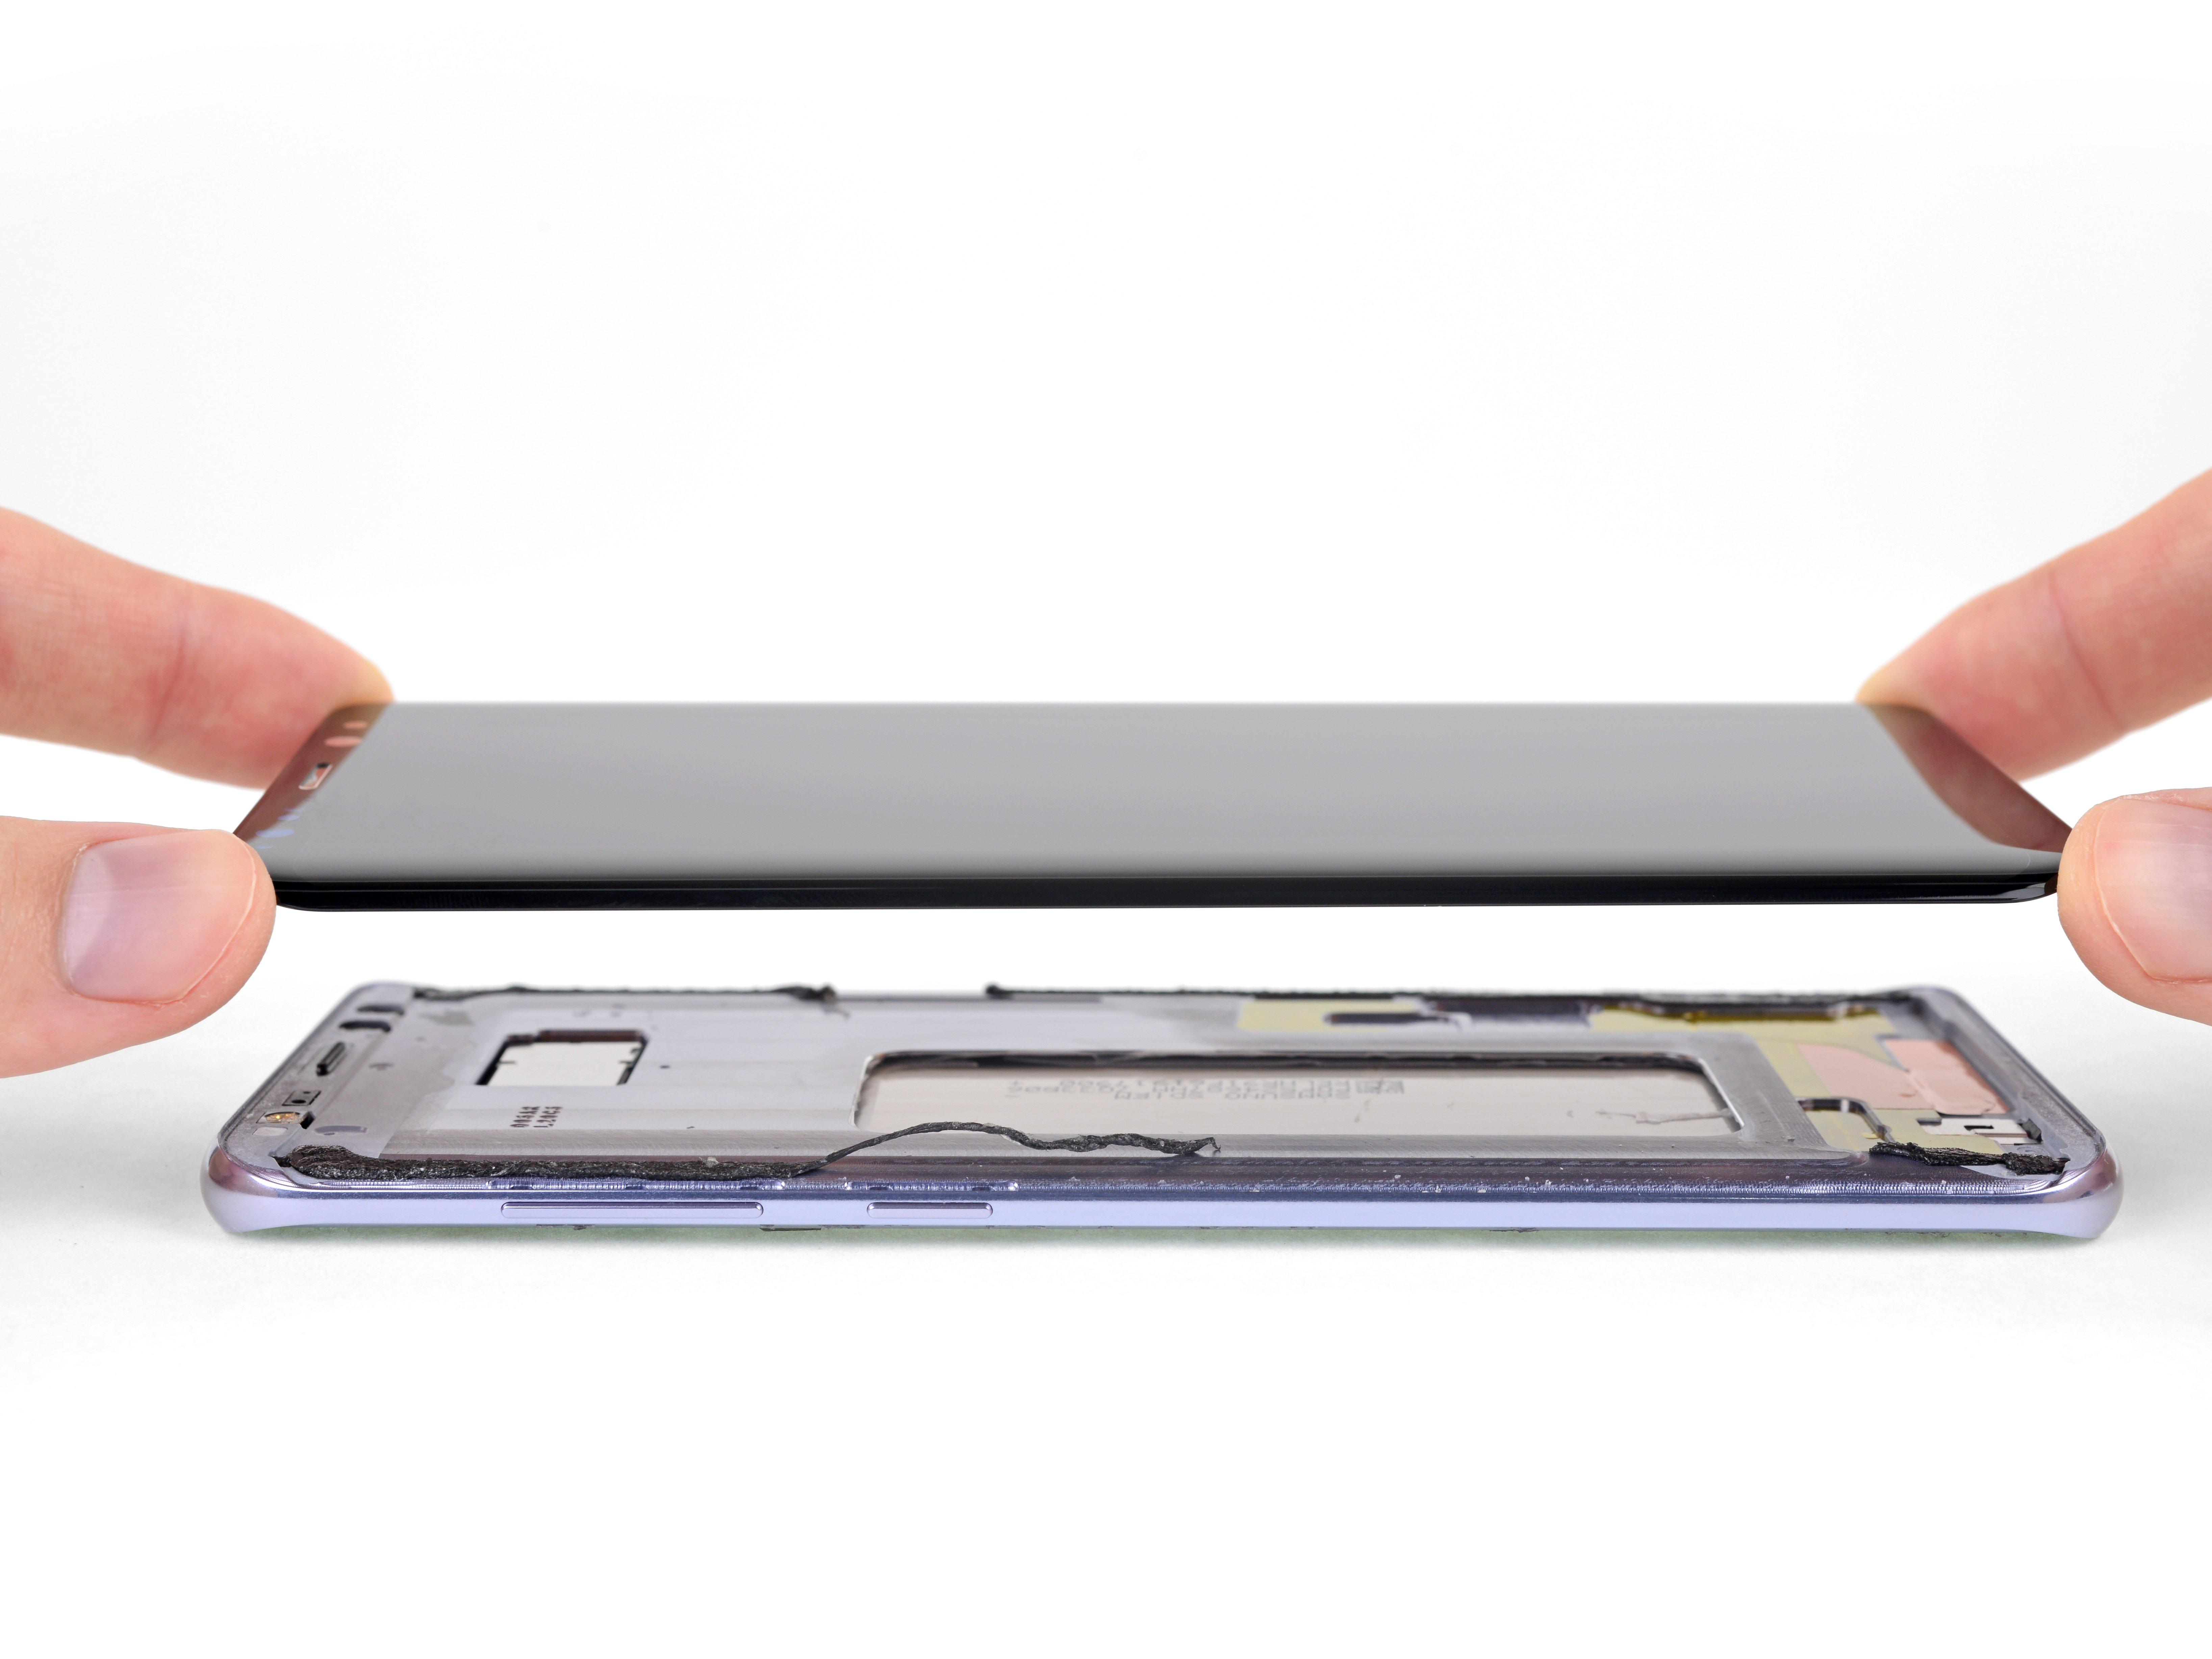 sale retailer da201 8c59b Samsung Galaxy S8 Plus Screen Replacement - iFixit Repair Guide